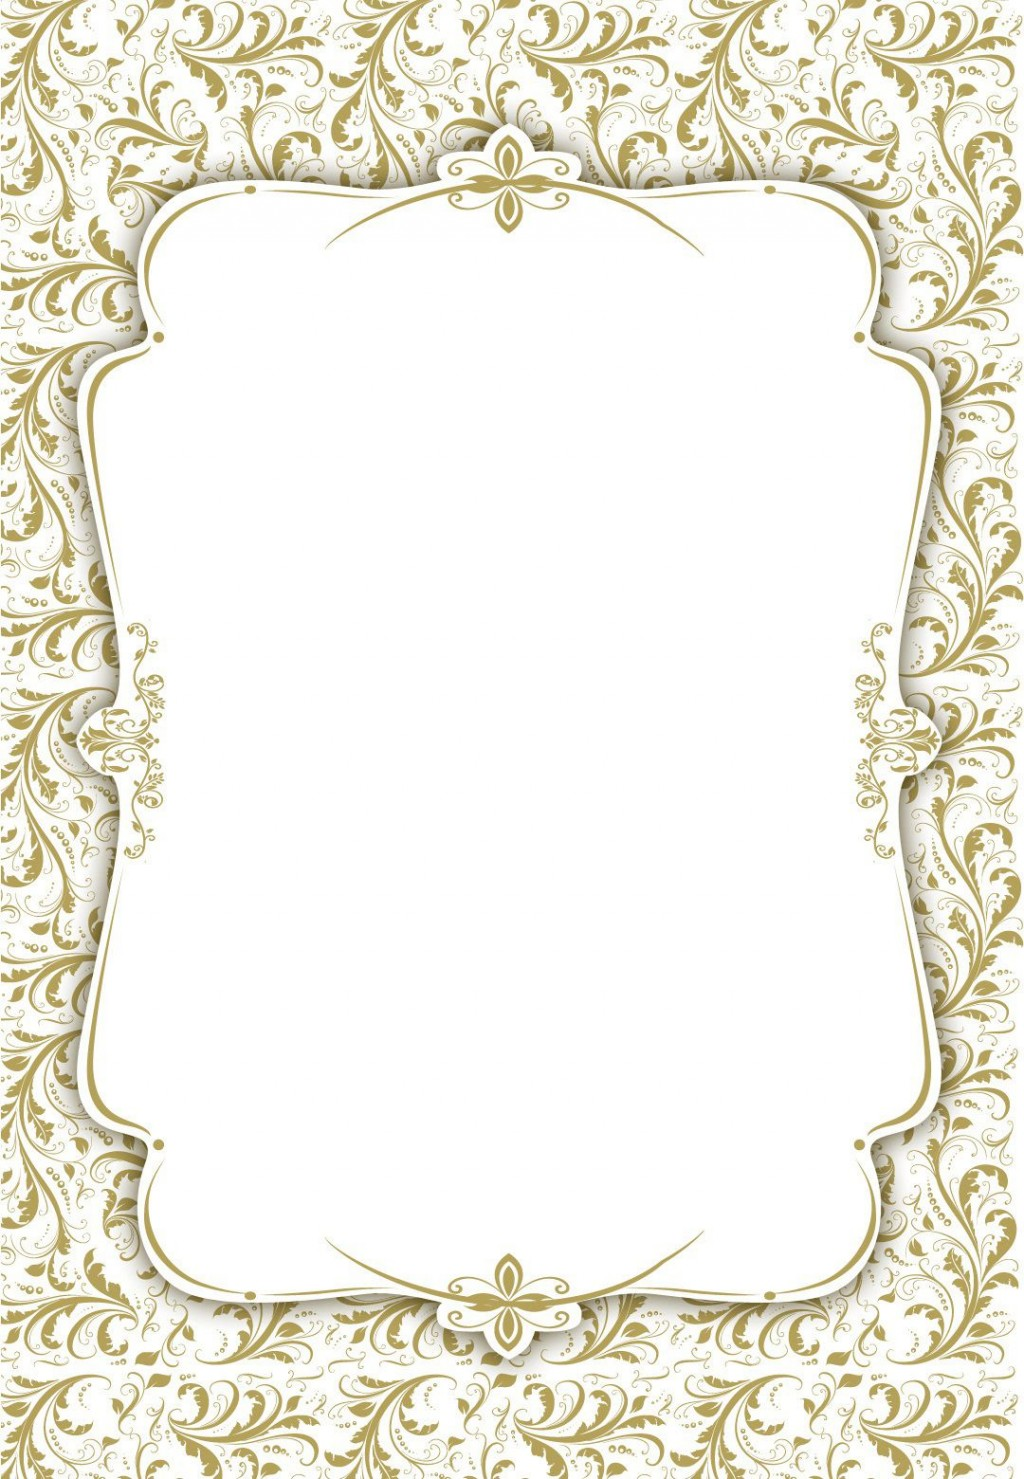 003 Stunning Blank Wedding Invitation Template Idea  Templates Free Download Printable Royal BlueLarge